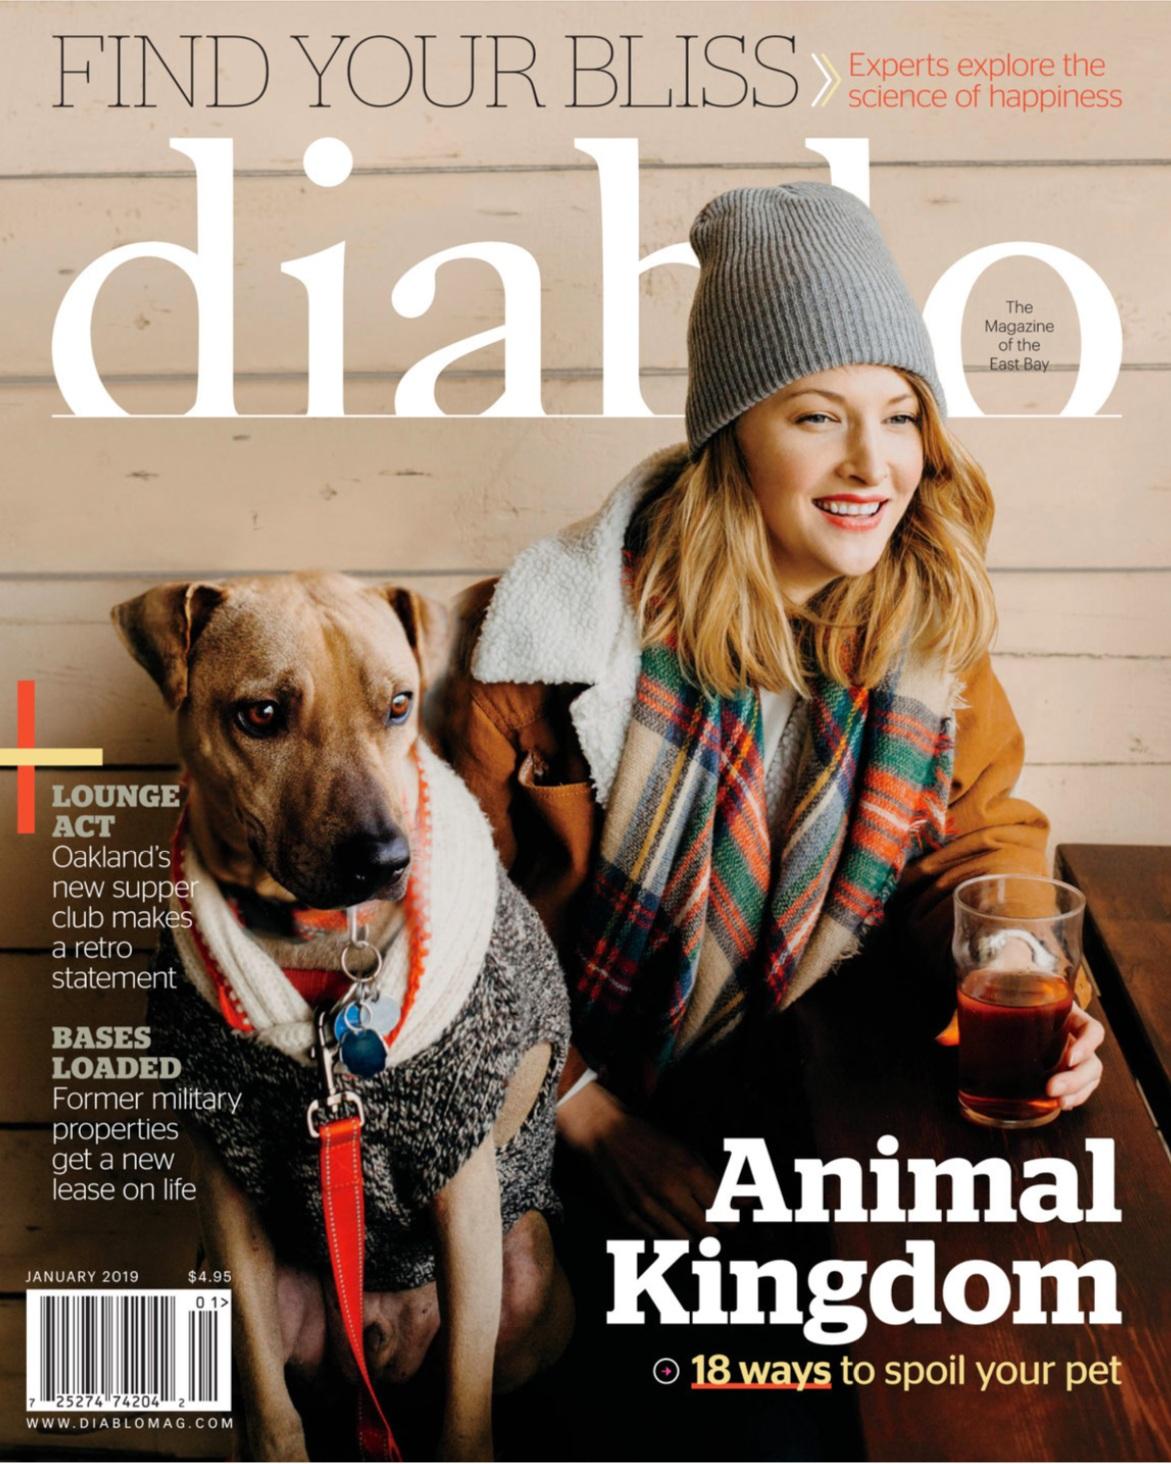 Diablo Magazine December 2018 - First Bite, Albatross Soars.